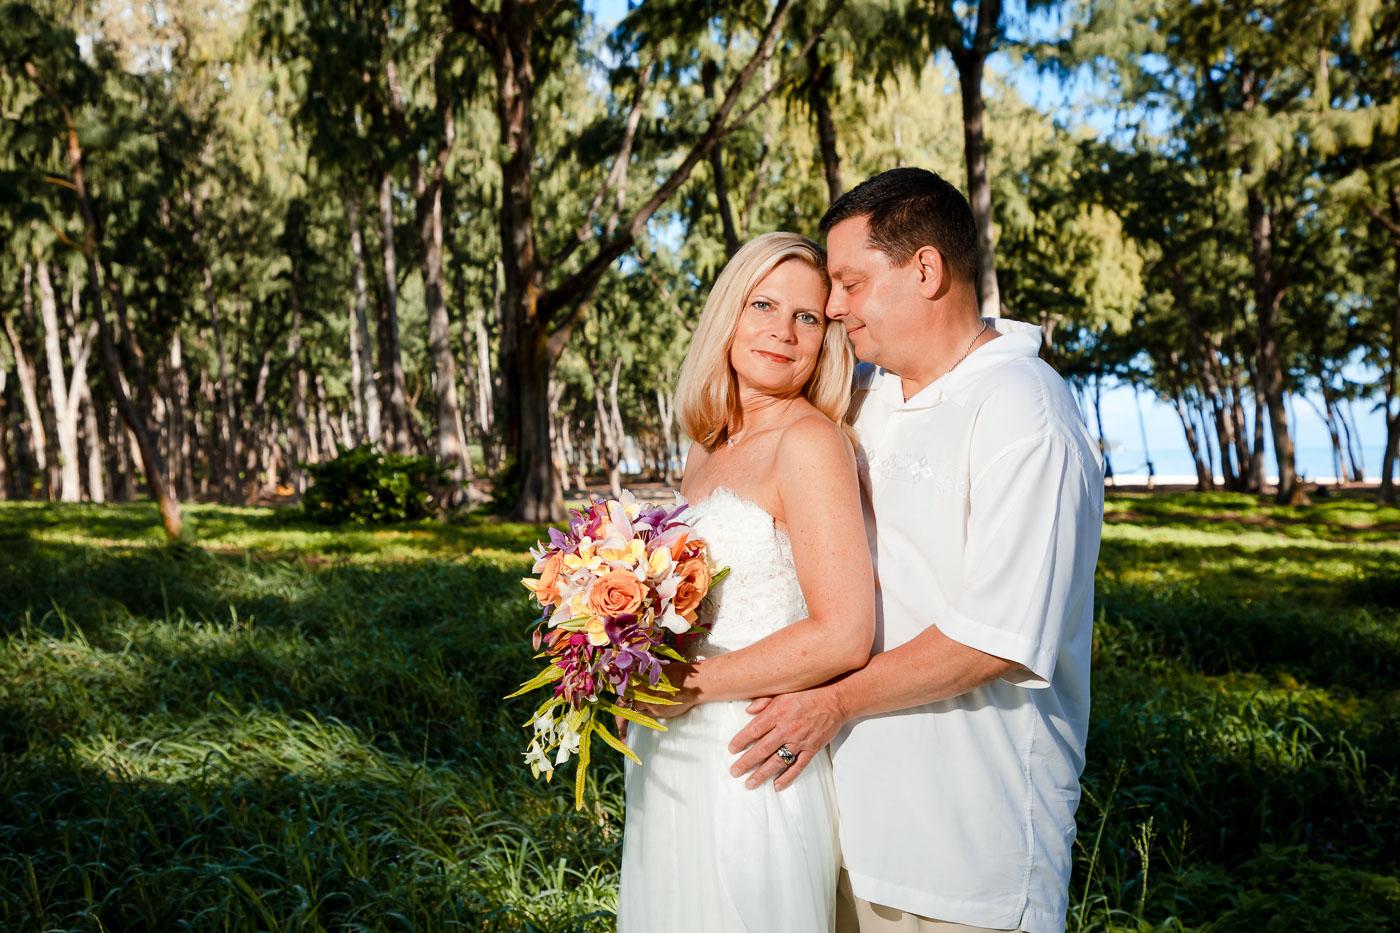 wedding-redux-41188.jpg